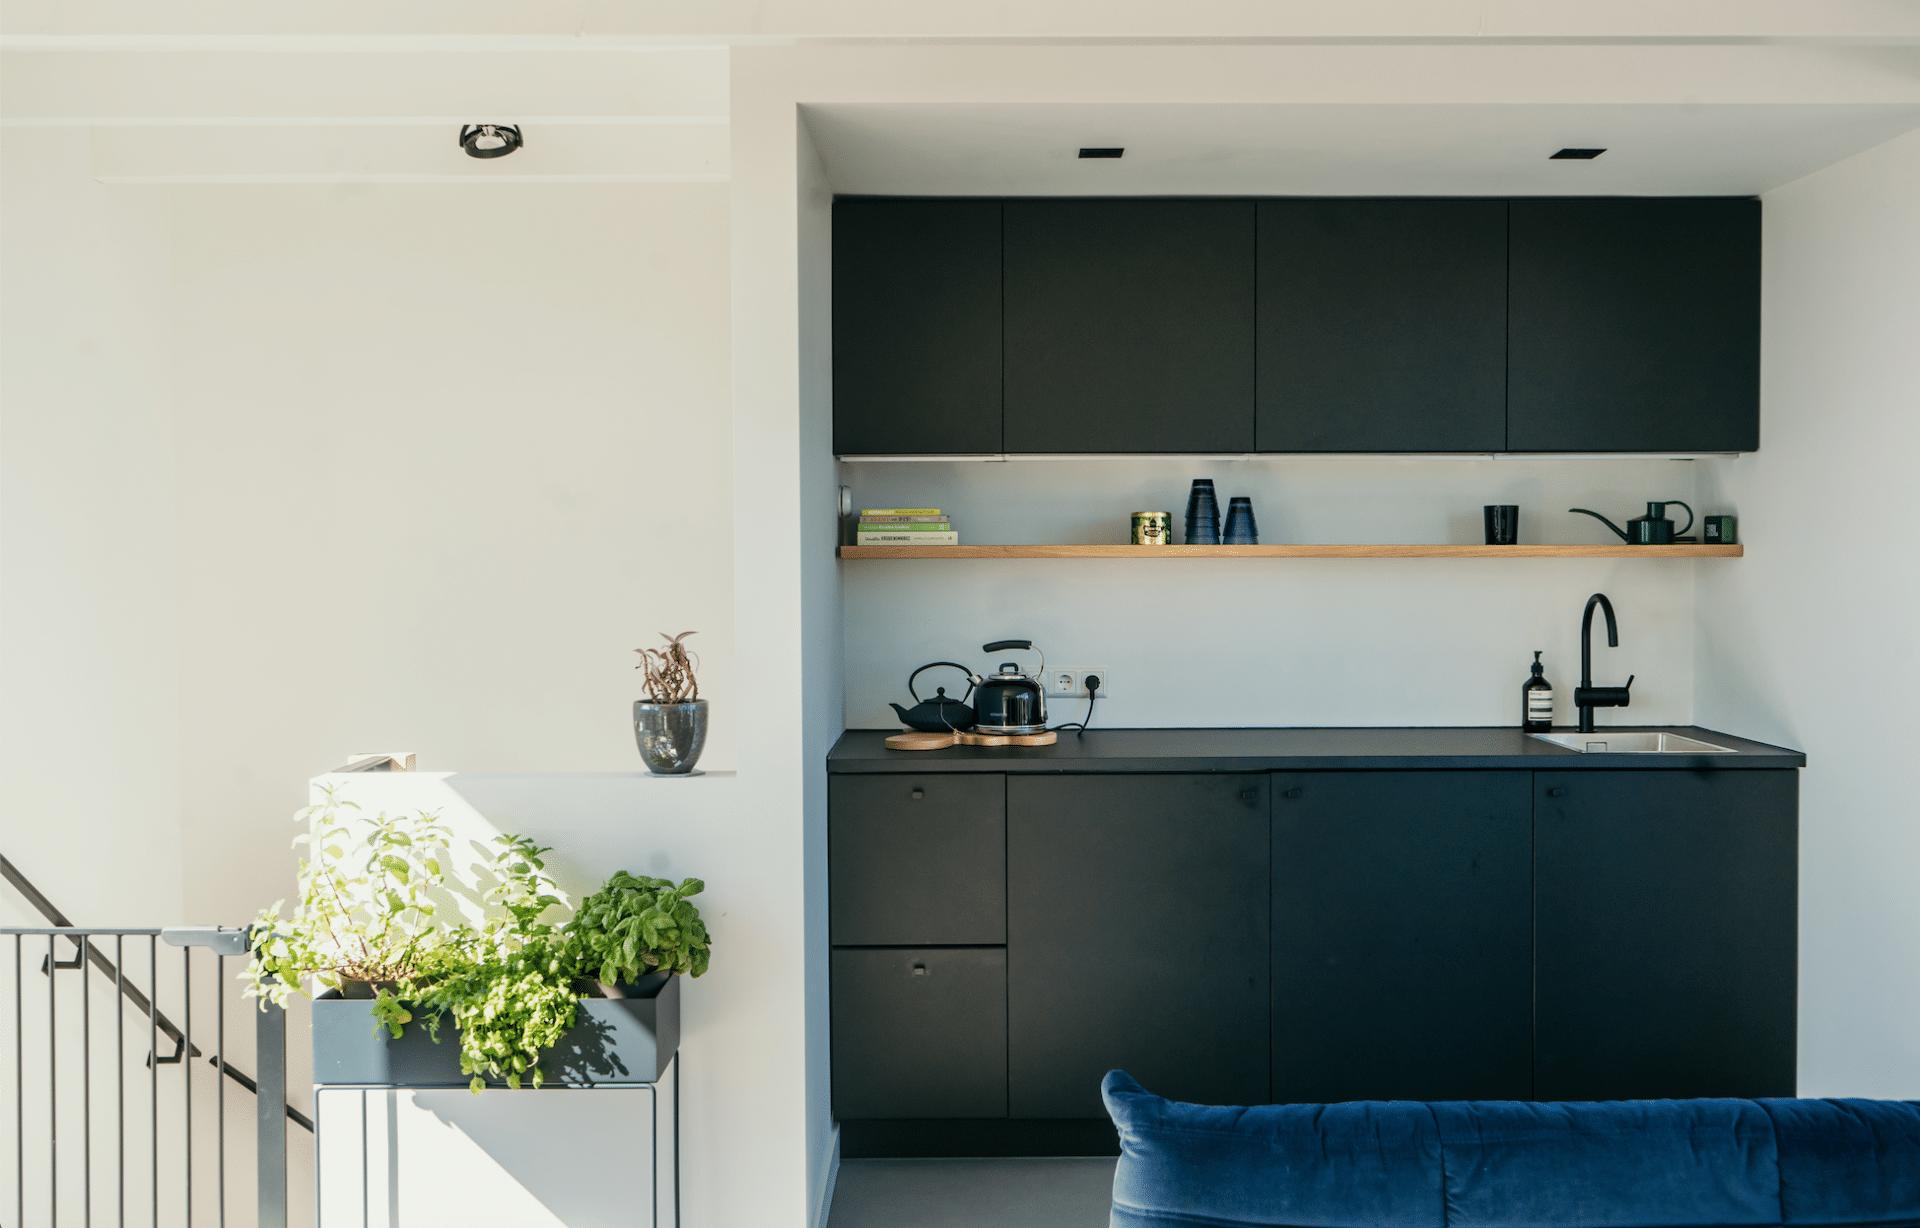 Zwarte Ikea keuken met eikenhouten plank